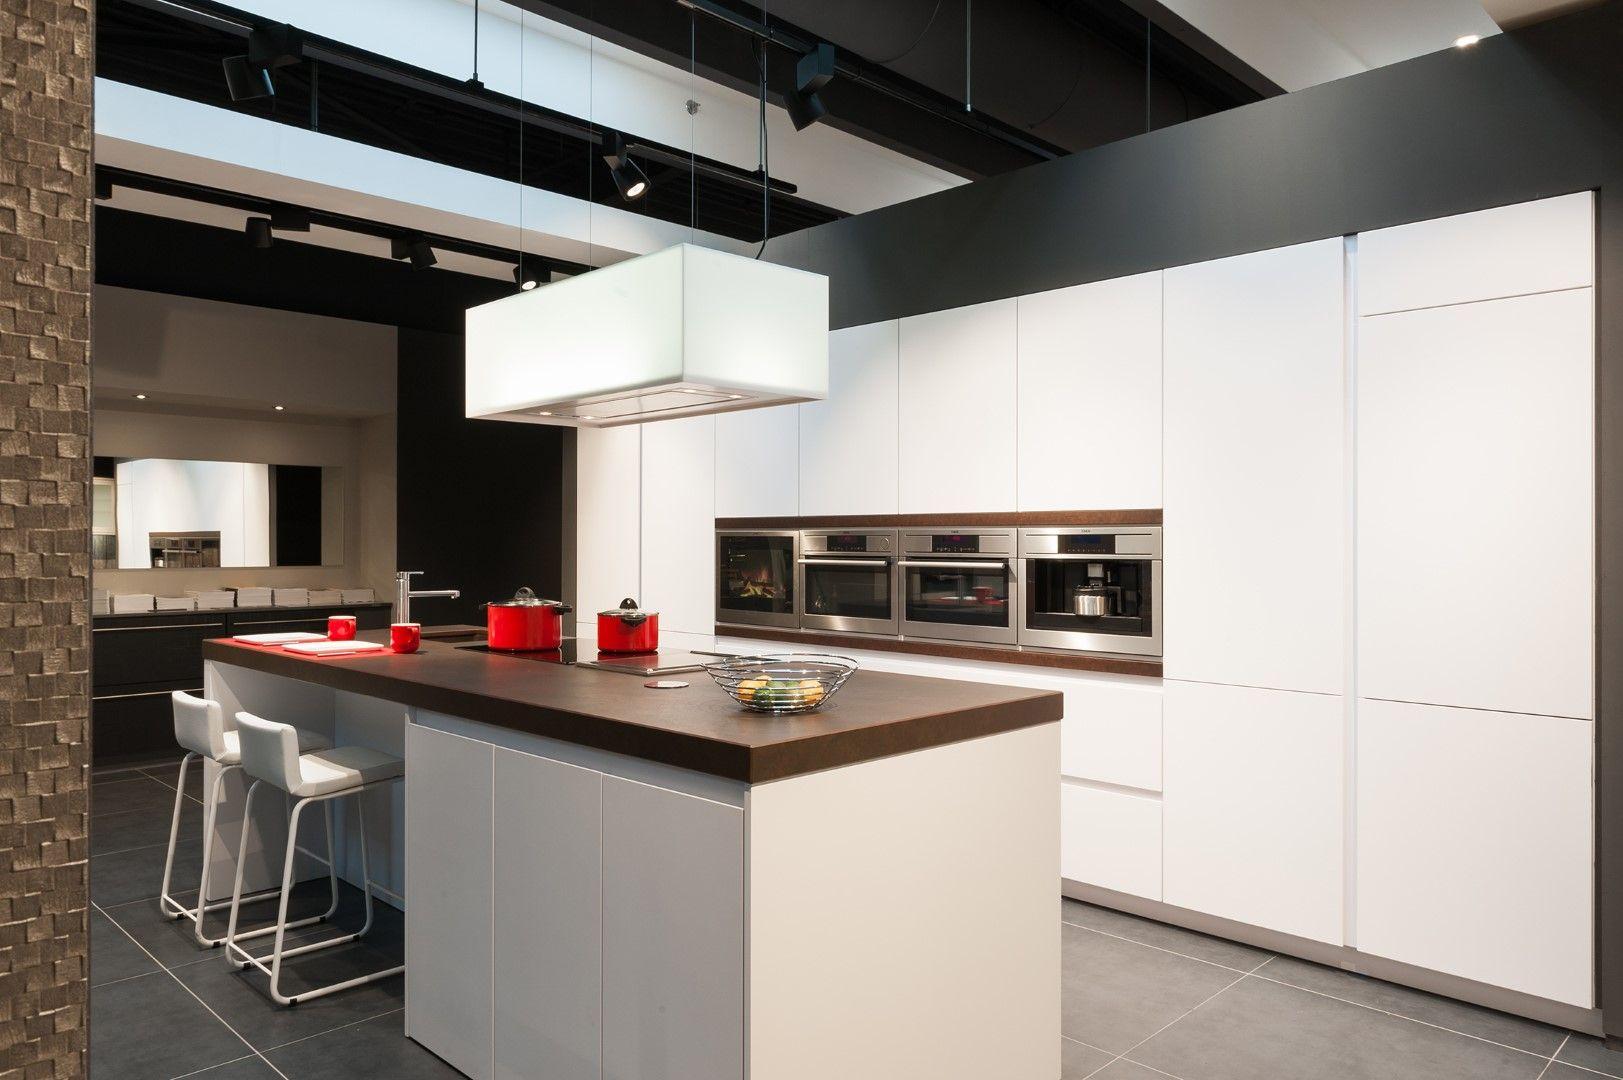 Moderne keuken - Realisaties - Keukens - Deba Meubelen | keuken ...